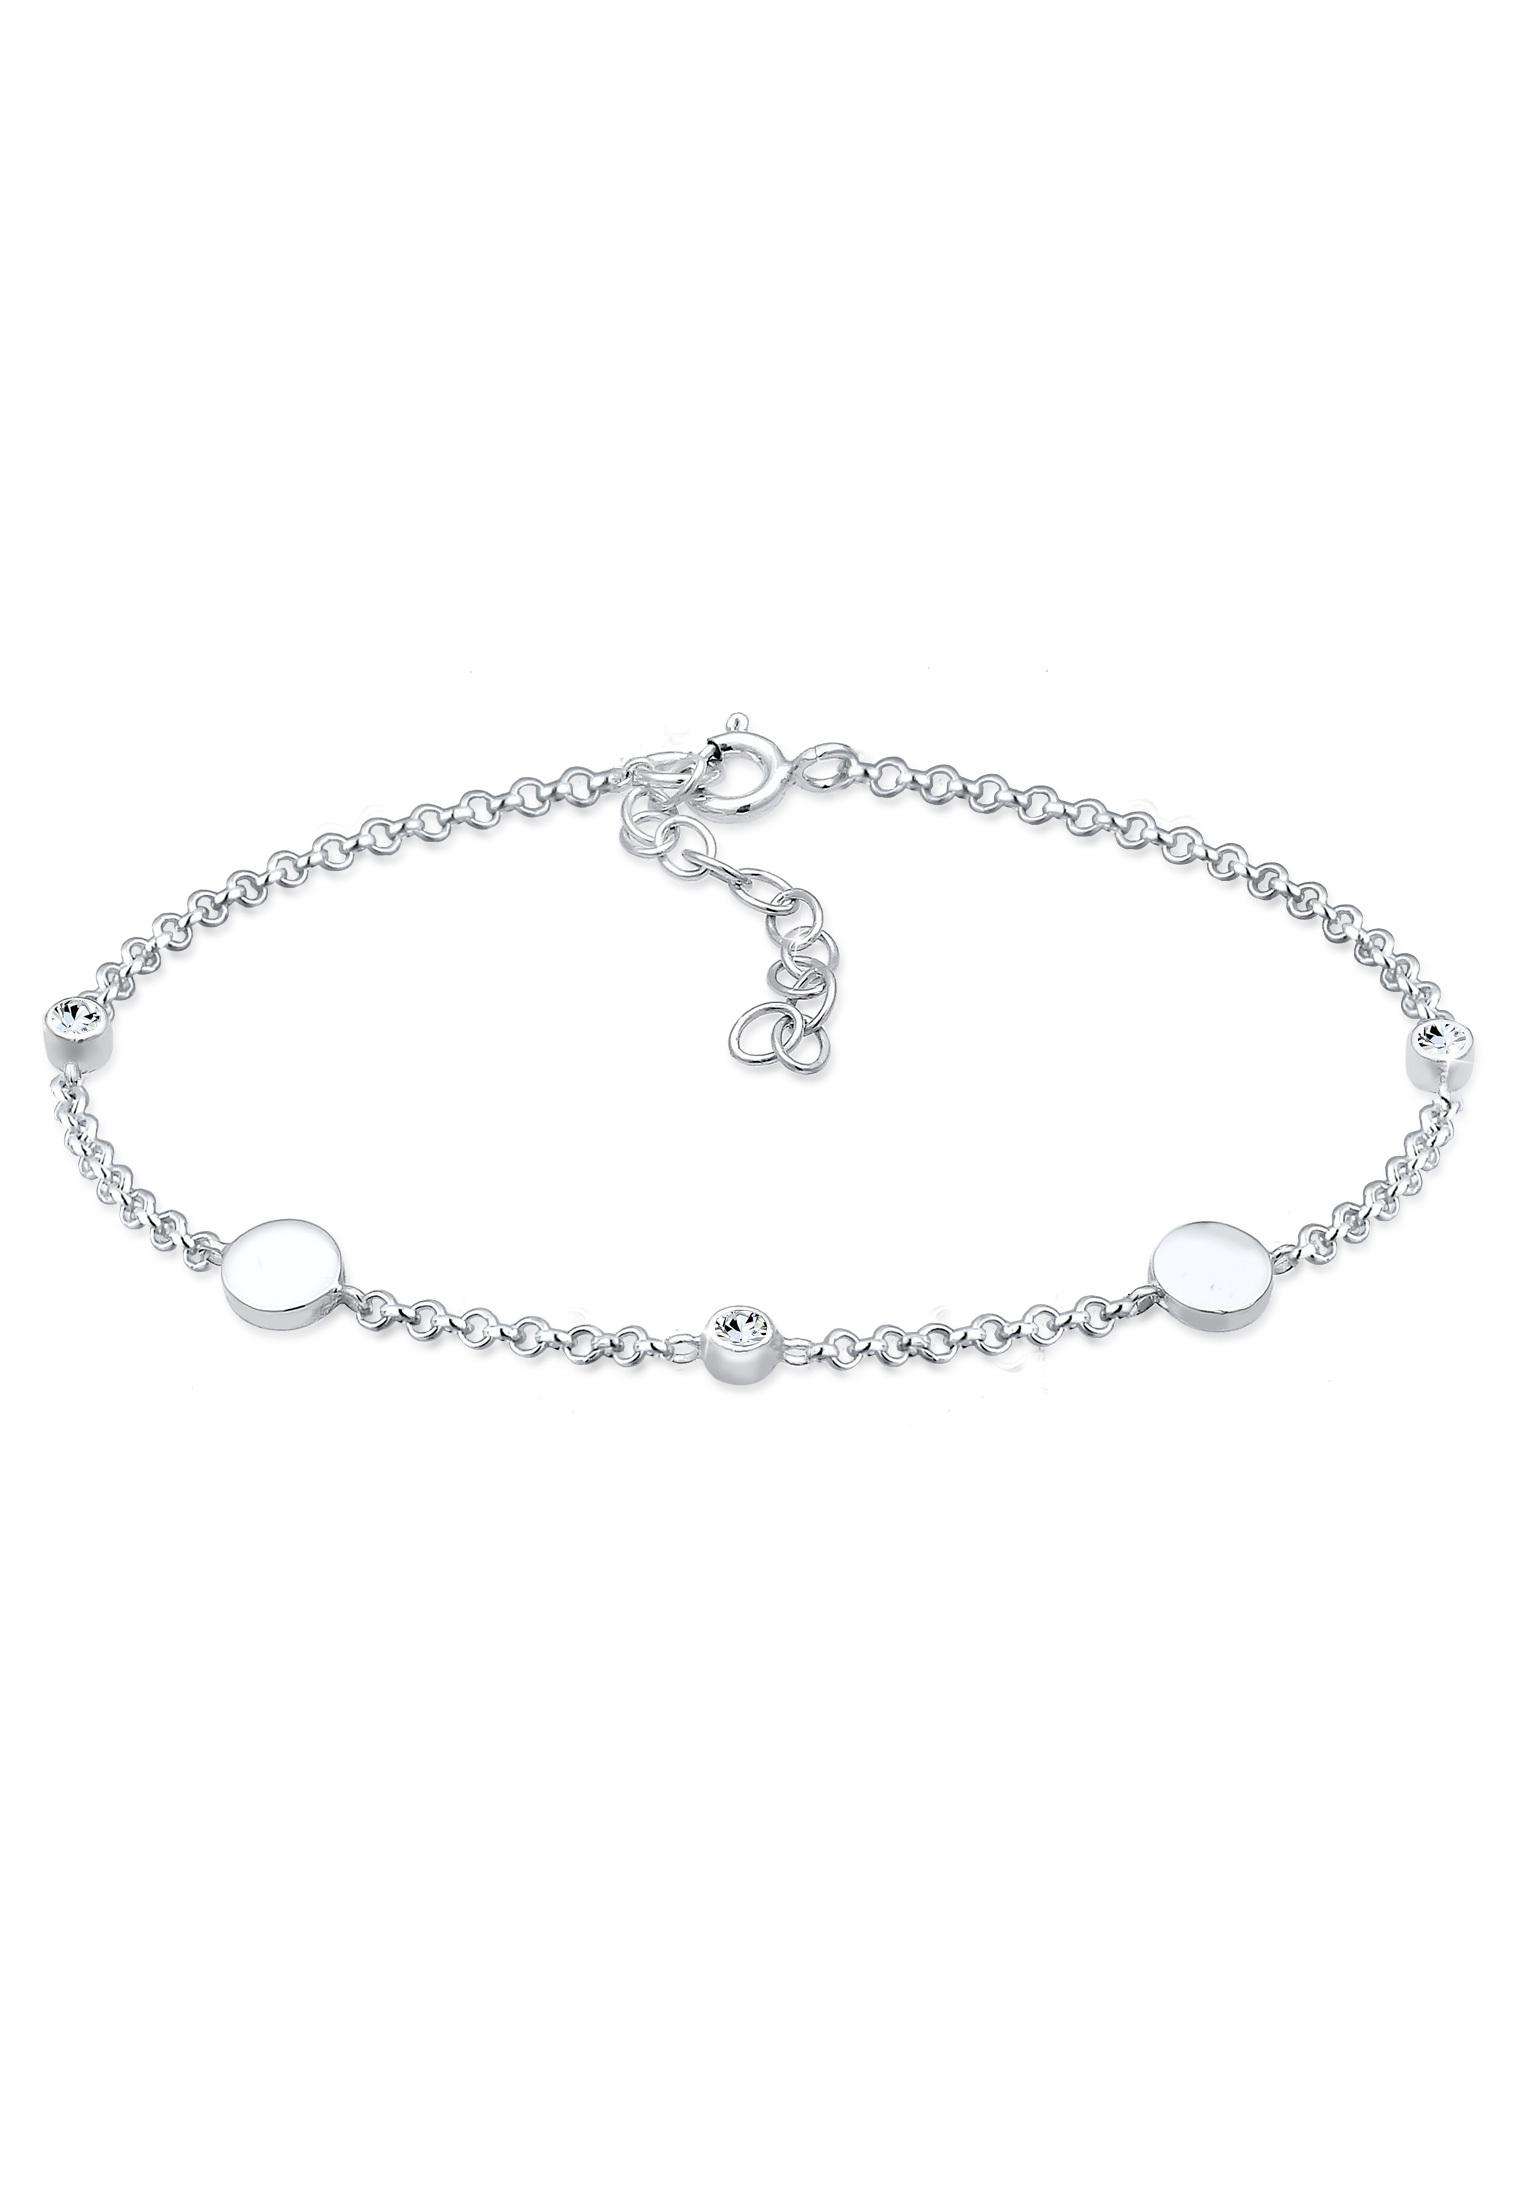 Armband Kreis | Kristall ( Weiß ) | 925er Sterling Silber